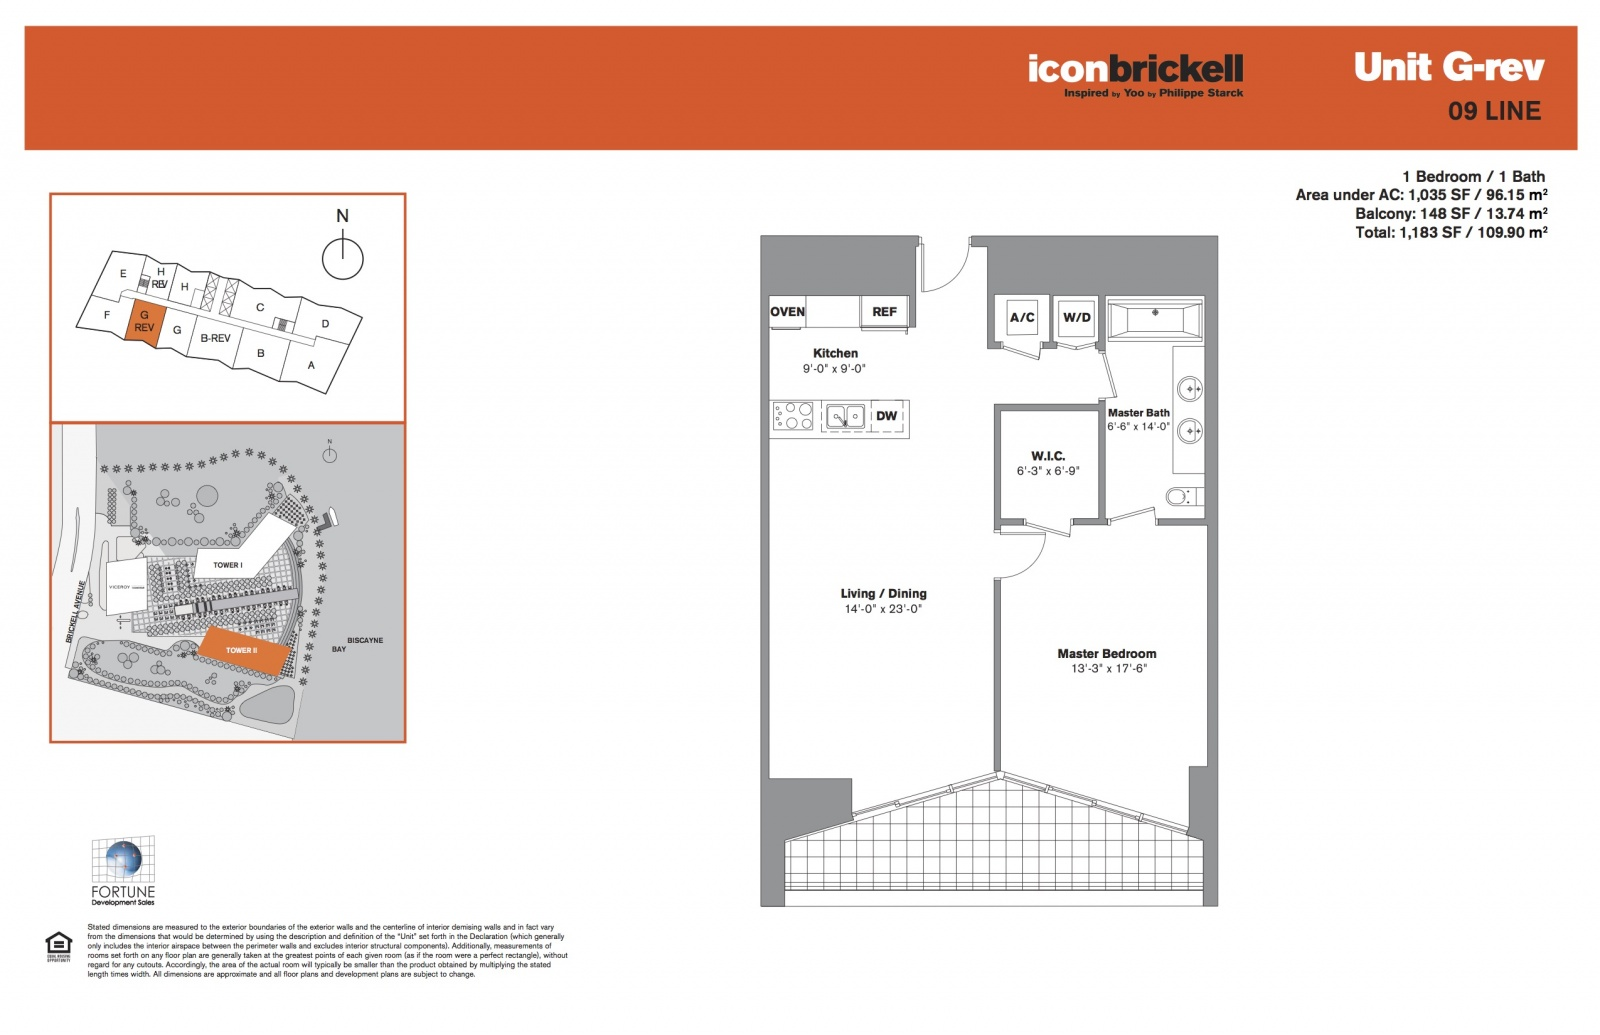 Icon Brickell Two Line 09 floor plan